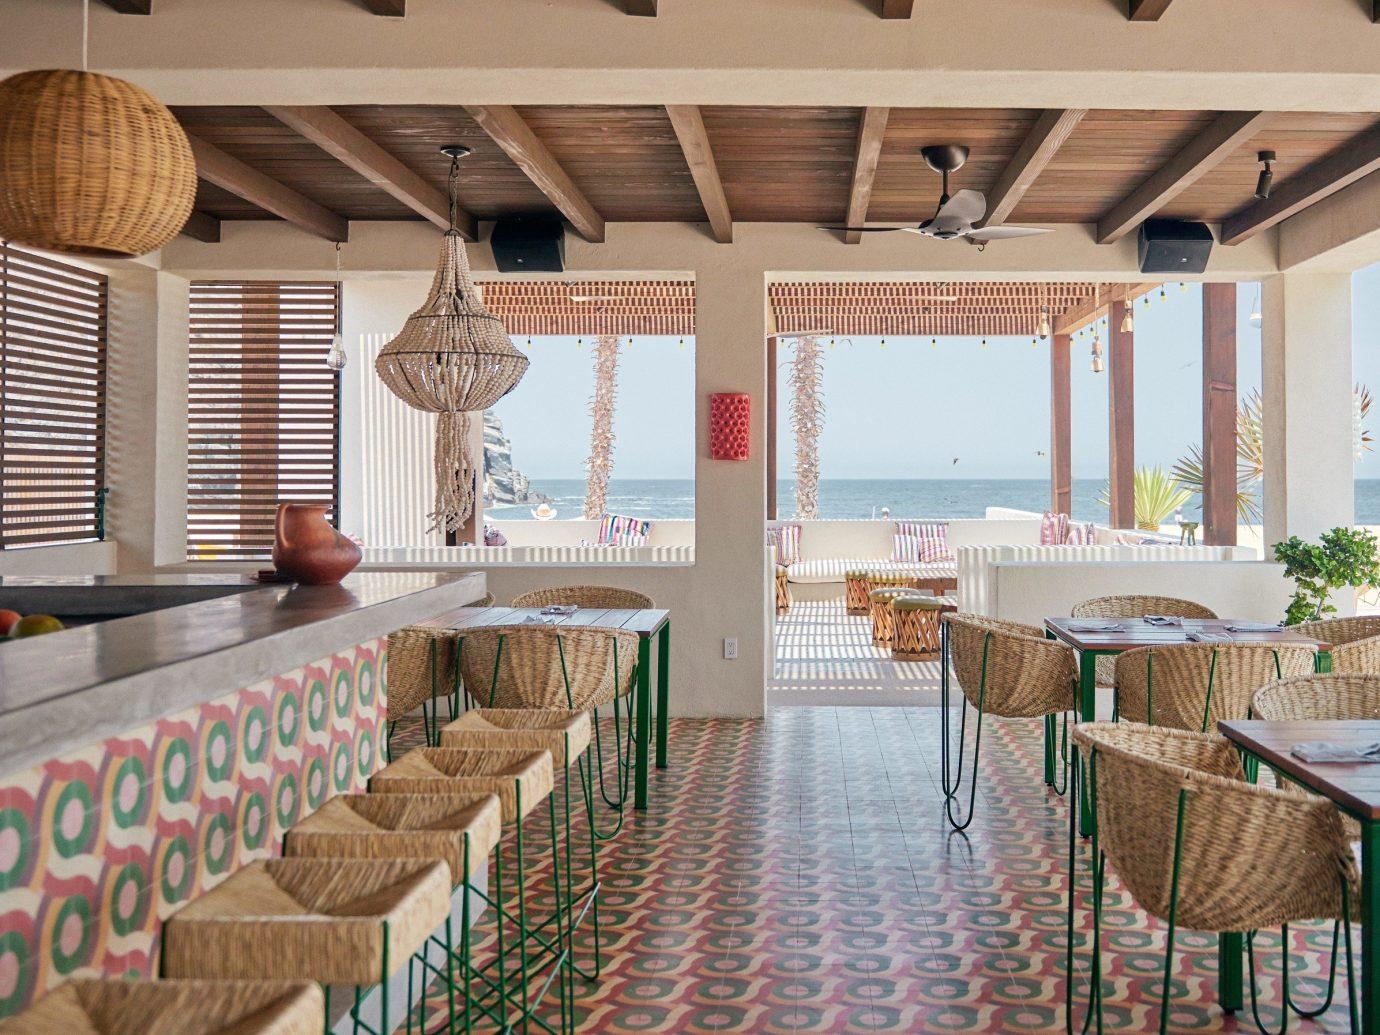 Beach Honeymoon Hotels Mexico Romance Tulum indoor floor chair room restaurant ceiling real estate interior design Resort estate table apartment furniture area several